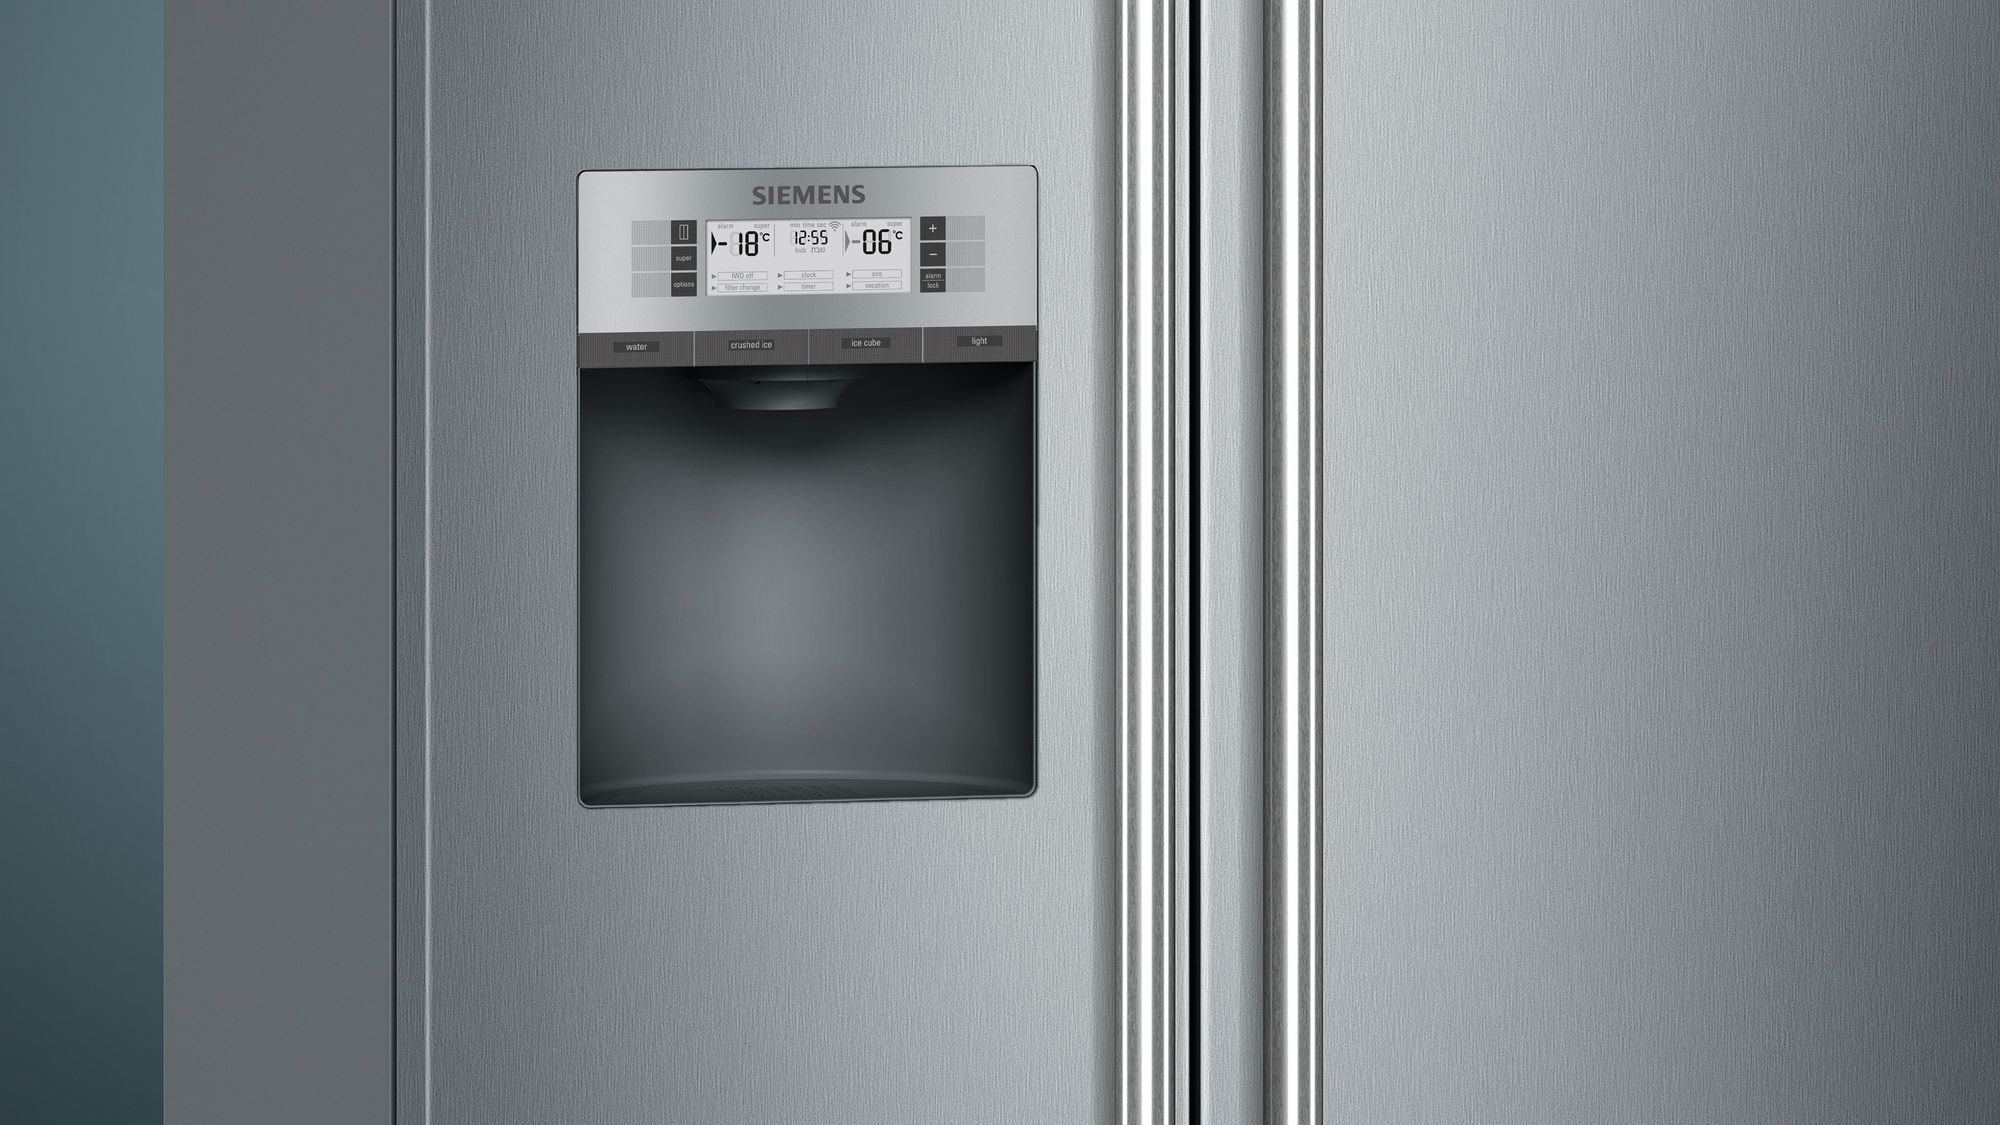 Side By Side Kühlschrank Geizhals : Siemens set side by side kühl gefrierkombination edelstahl